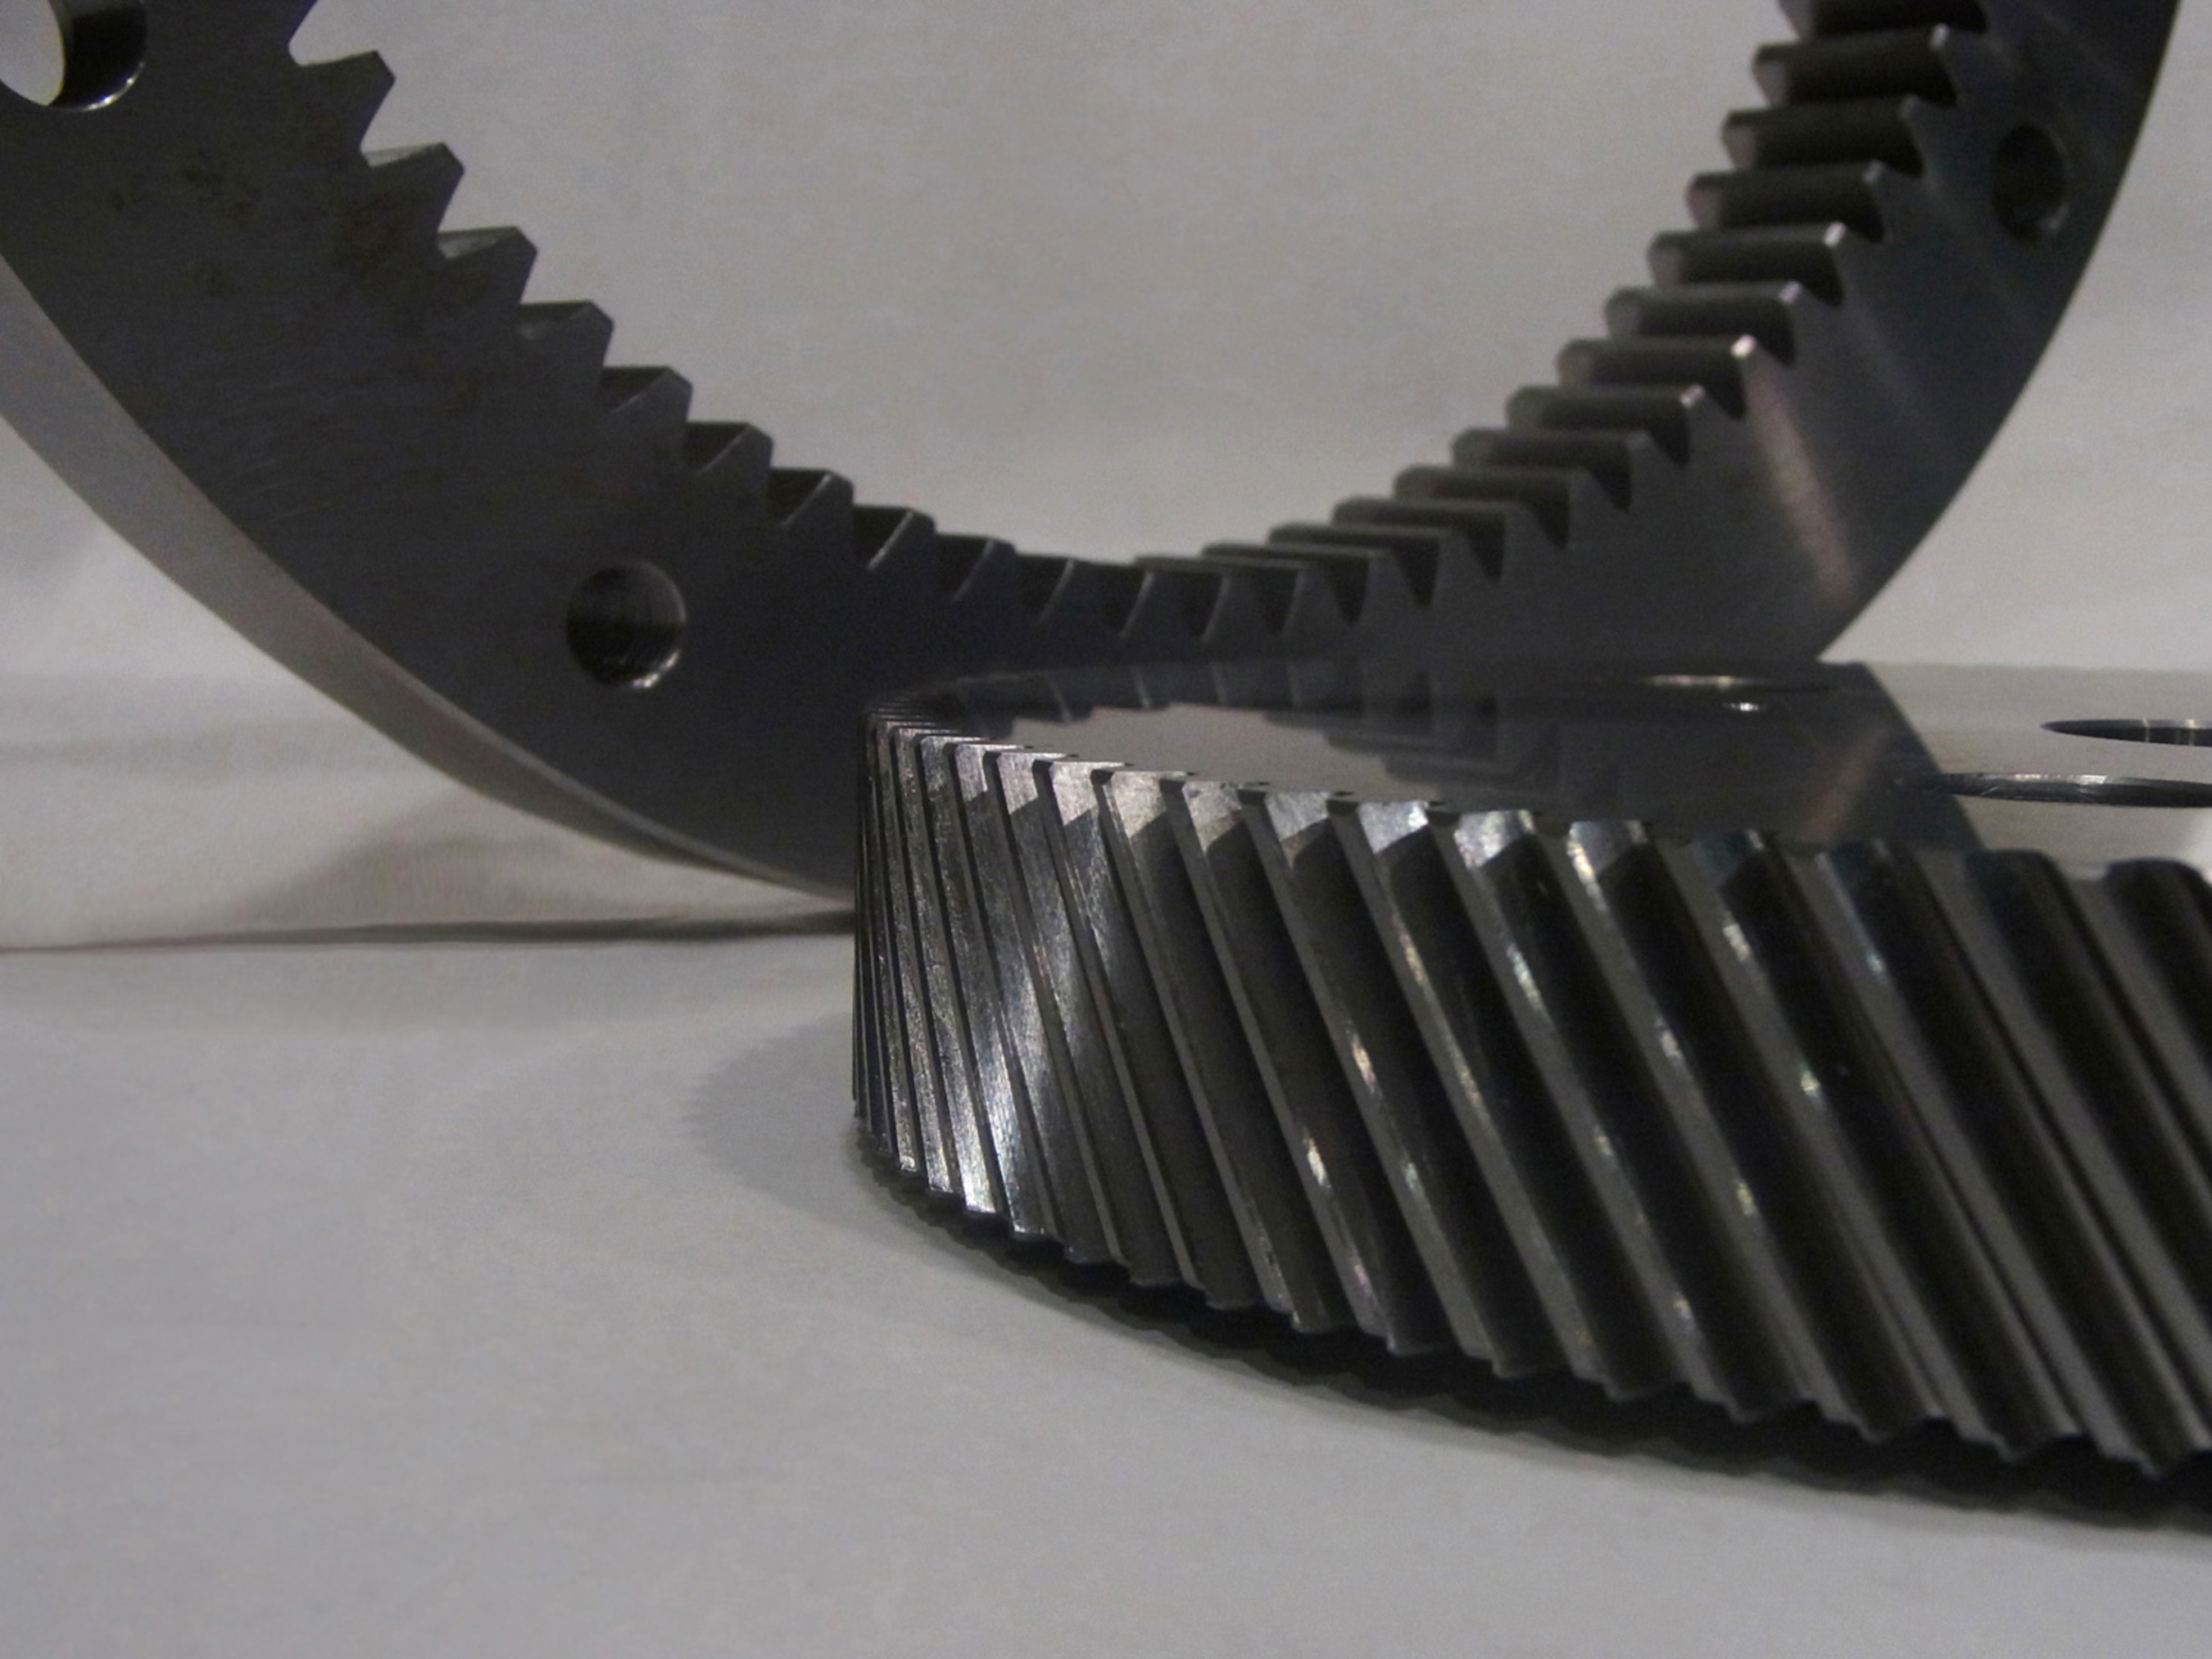 Helical Gear shaped by ST40A. (PRNewsFoto/Mitsubishi Heavy Industries, Ltd.) (PRNewsFoto/MITSUBISHI HEAVY INDUSTRIES, LTD)